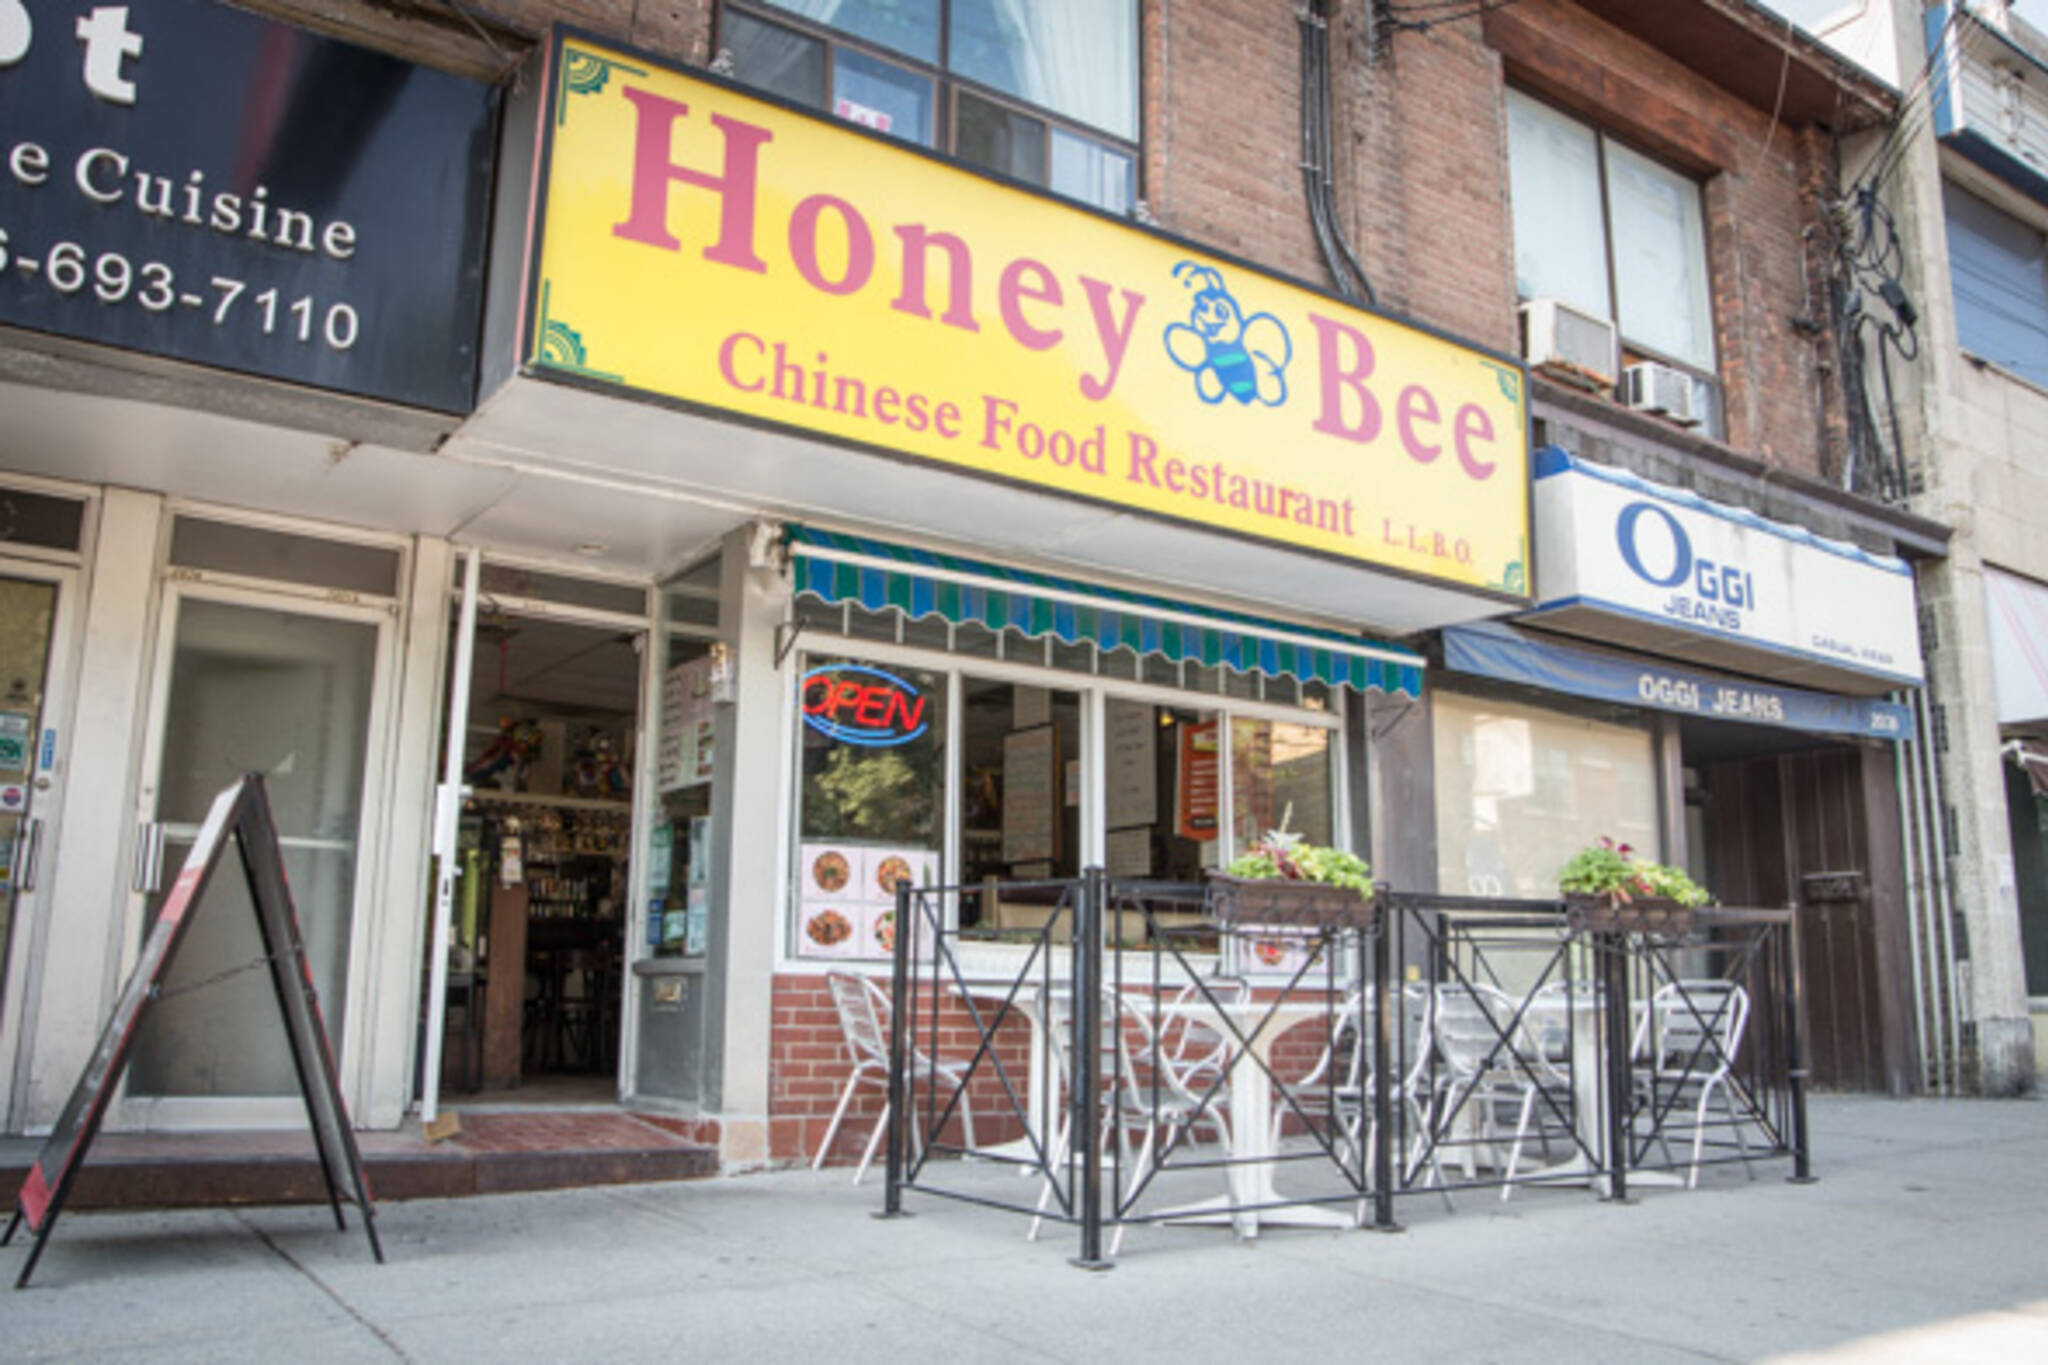 honey bee restaurant toronto